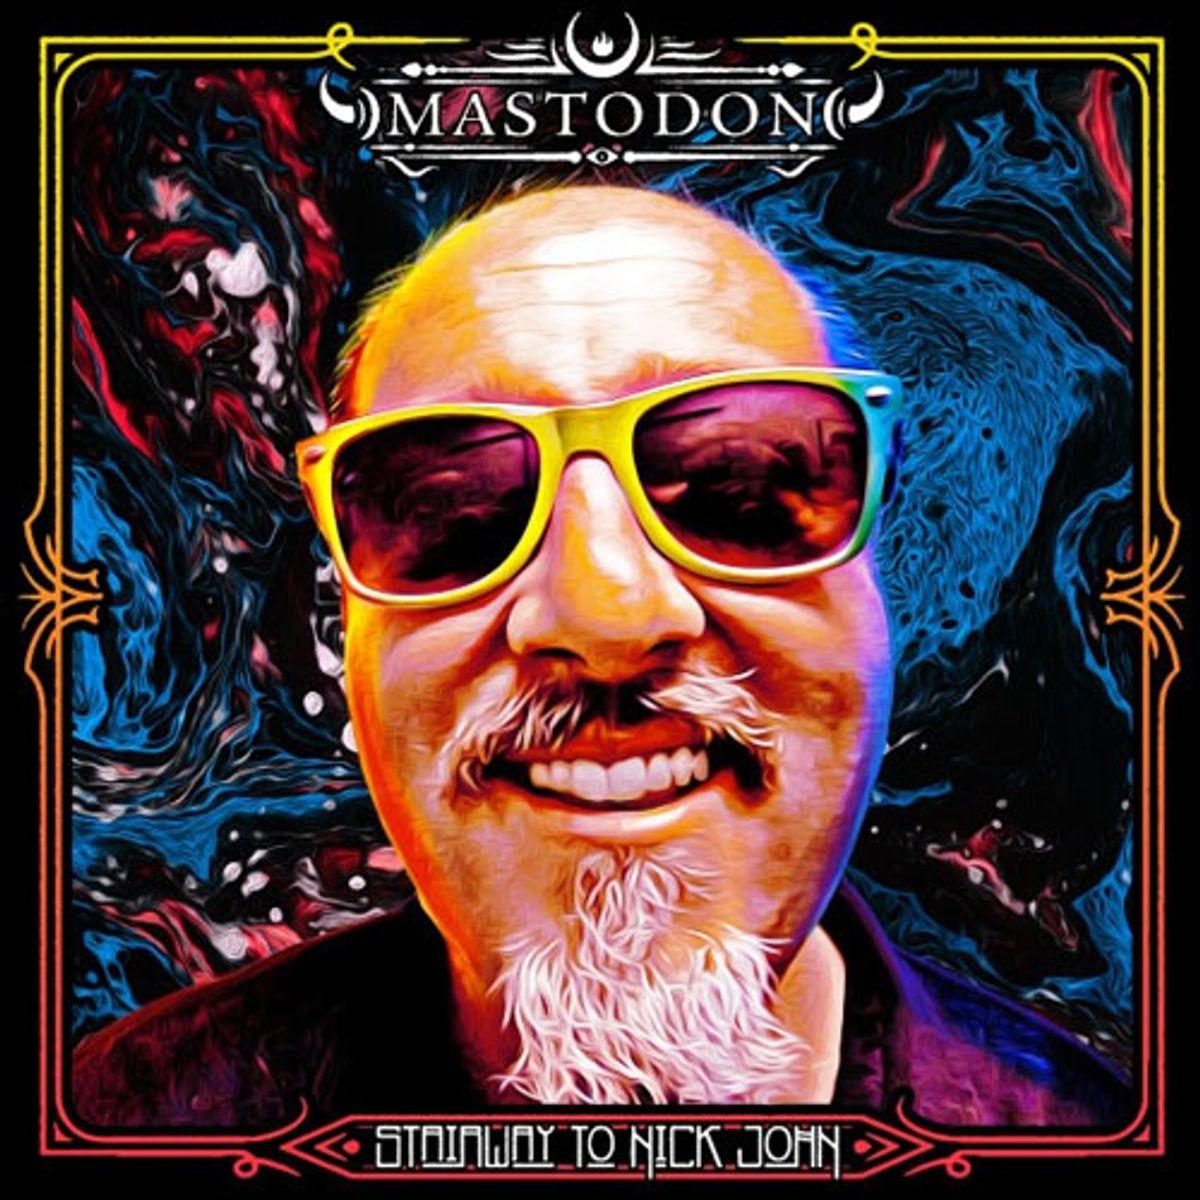 Mastodon Announces 'Stairway to Nick John' for Record Store Day